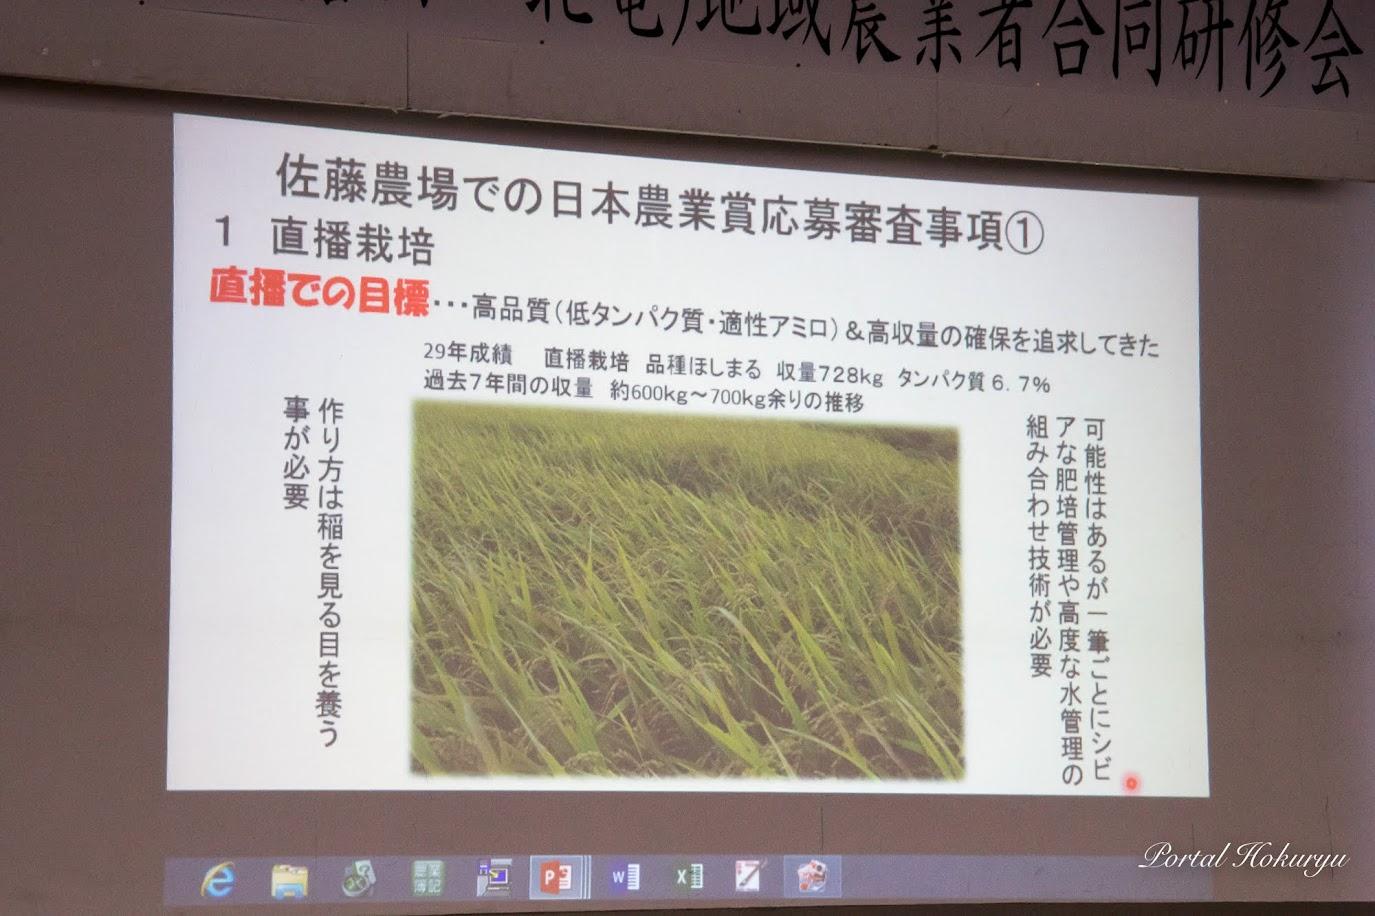 佐藤農場での日本農業賞応募審査事項(1)